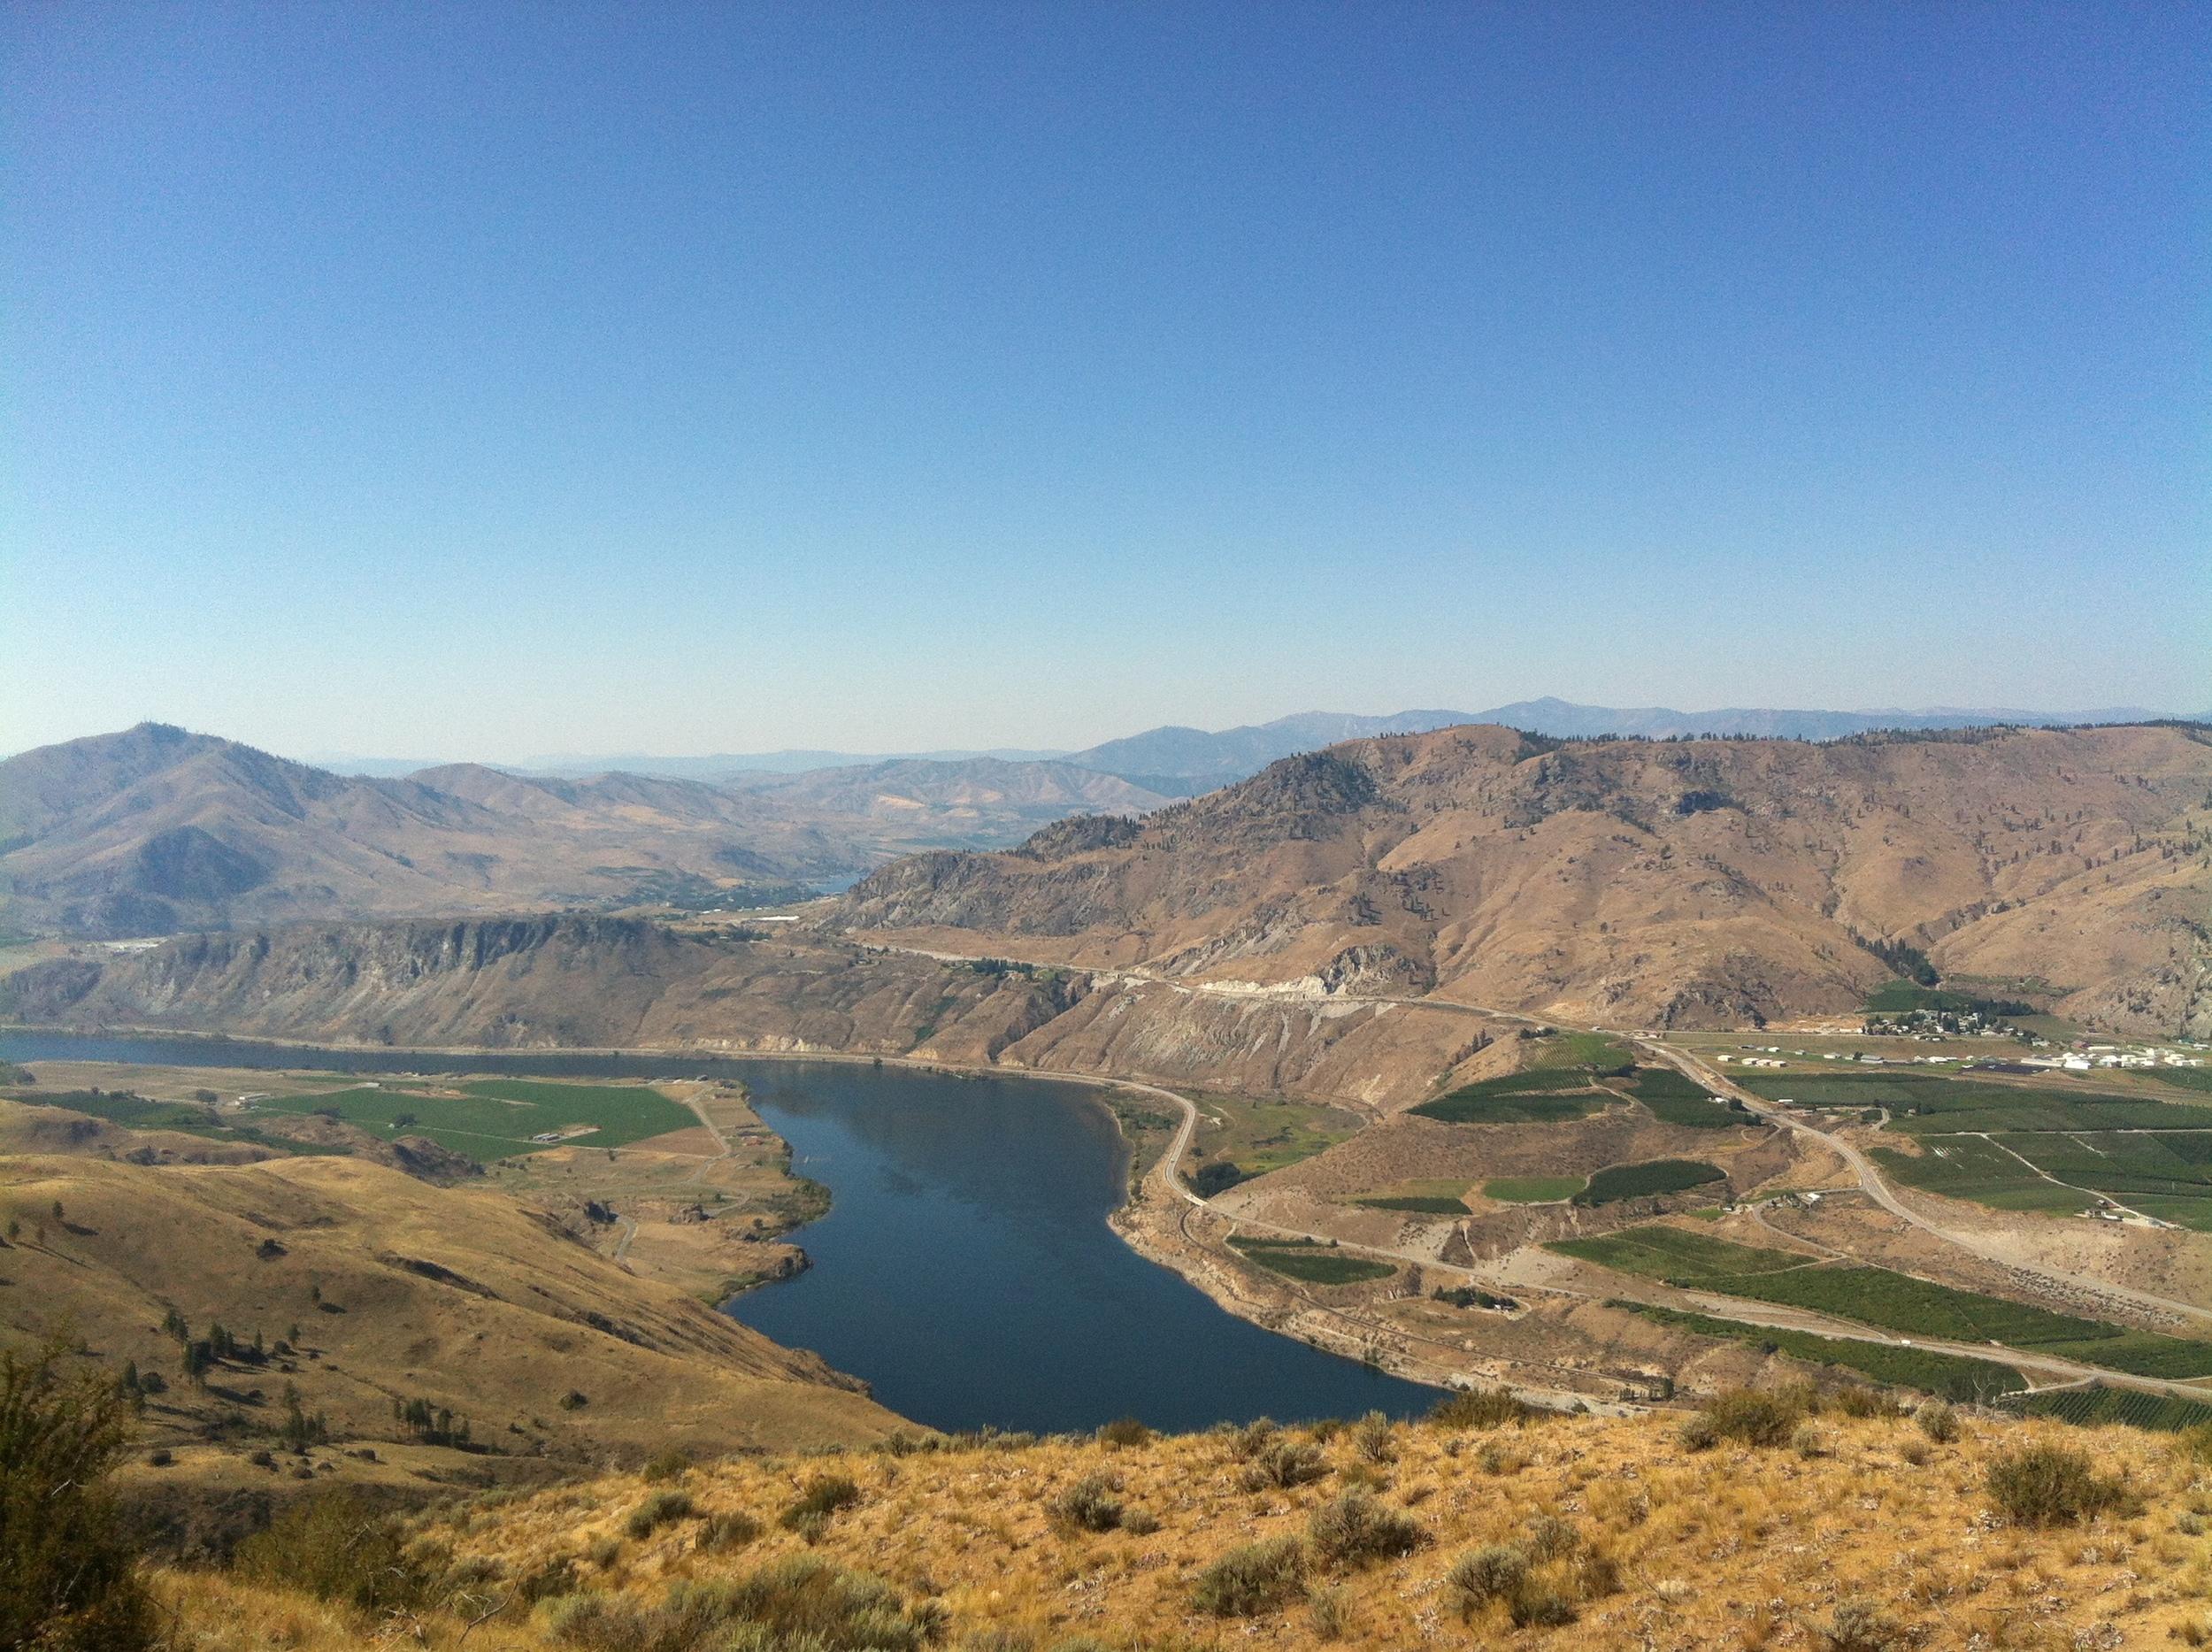 The main view westward.